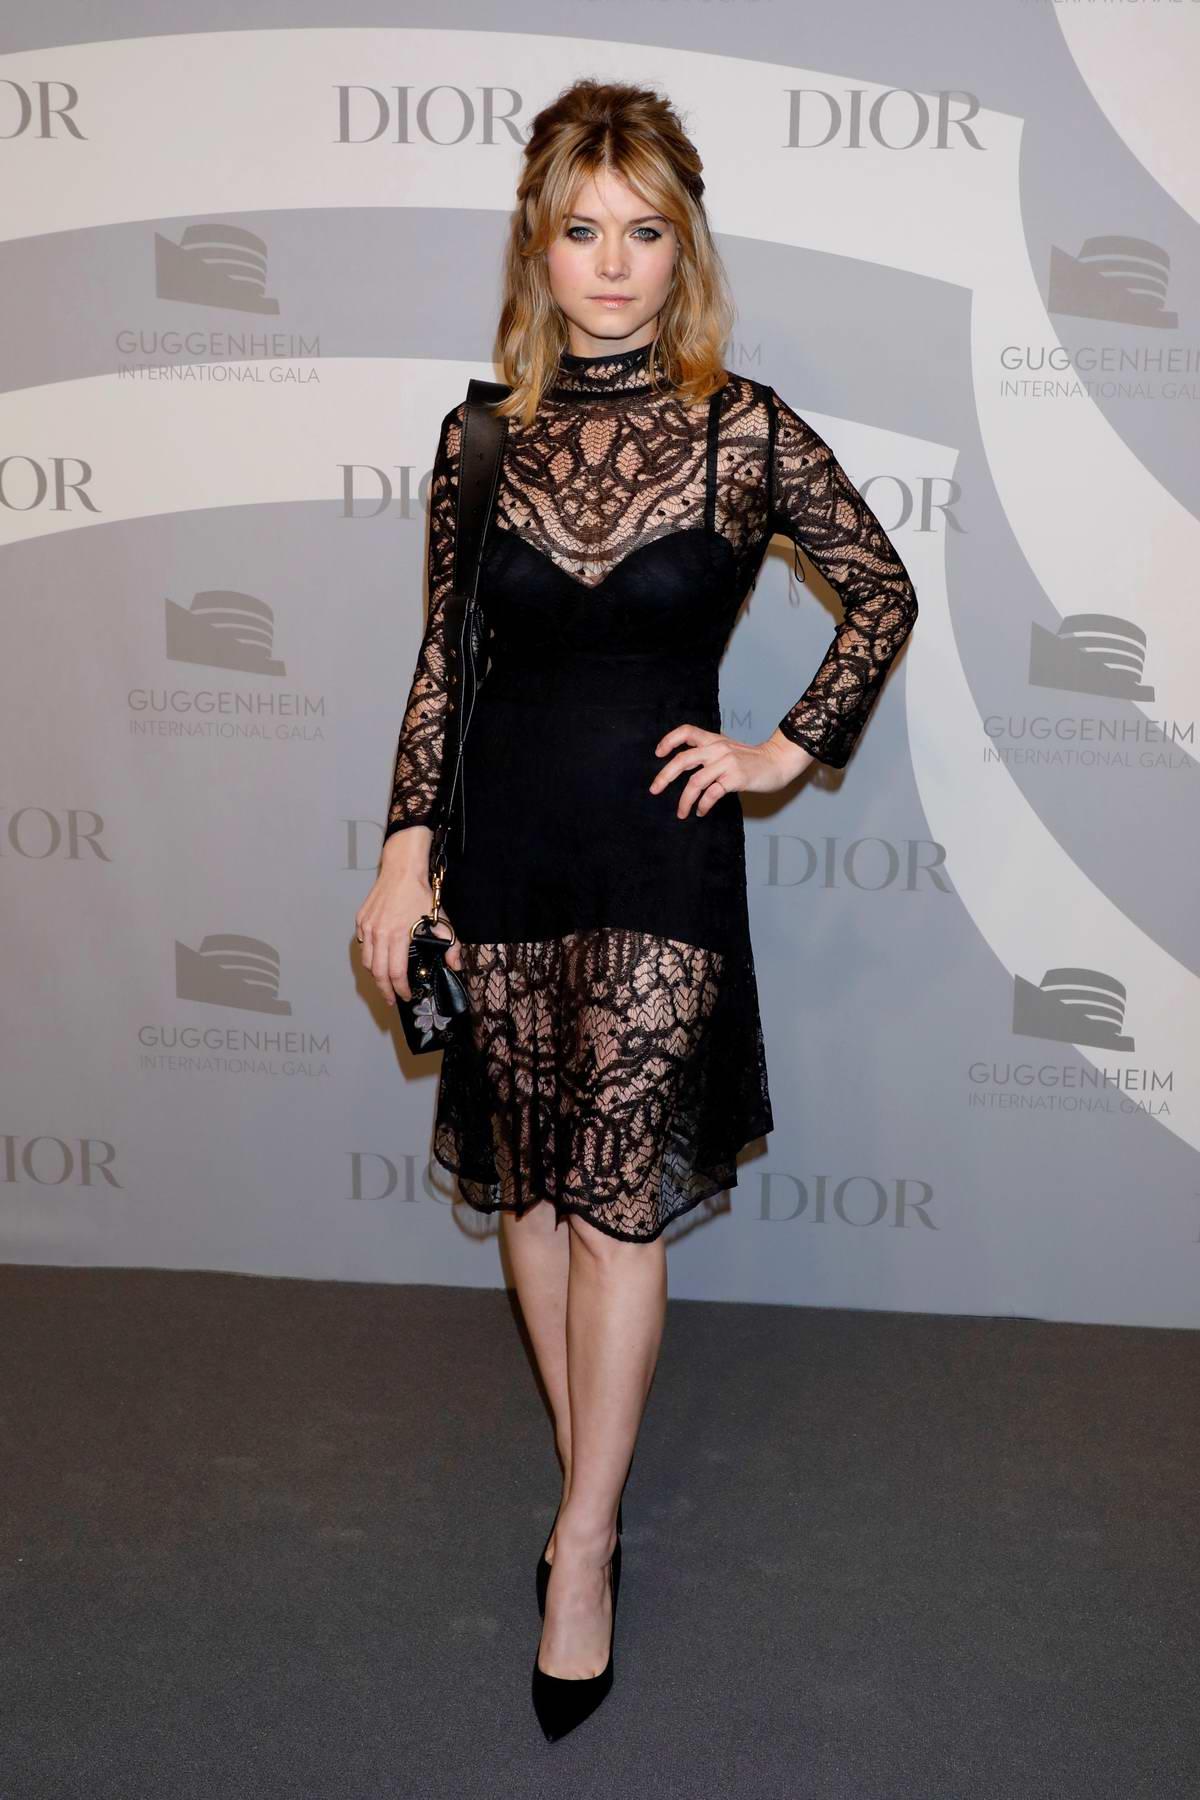 Sarah Jones attends the Guggenheim International Gala at The Guggenheim in New York City